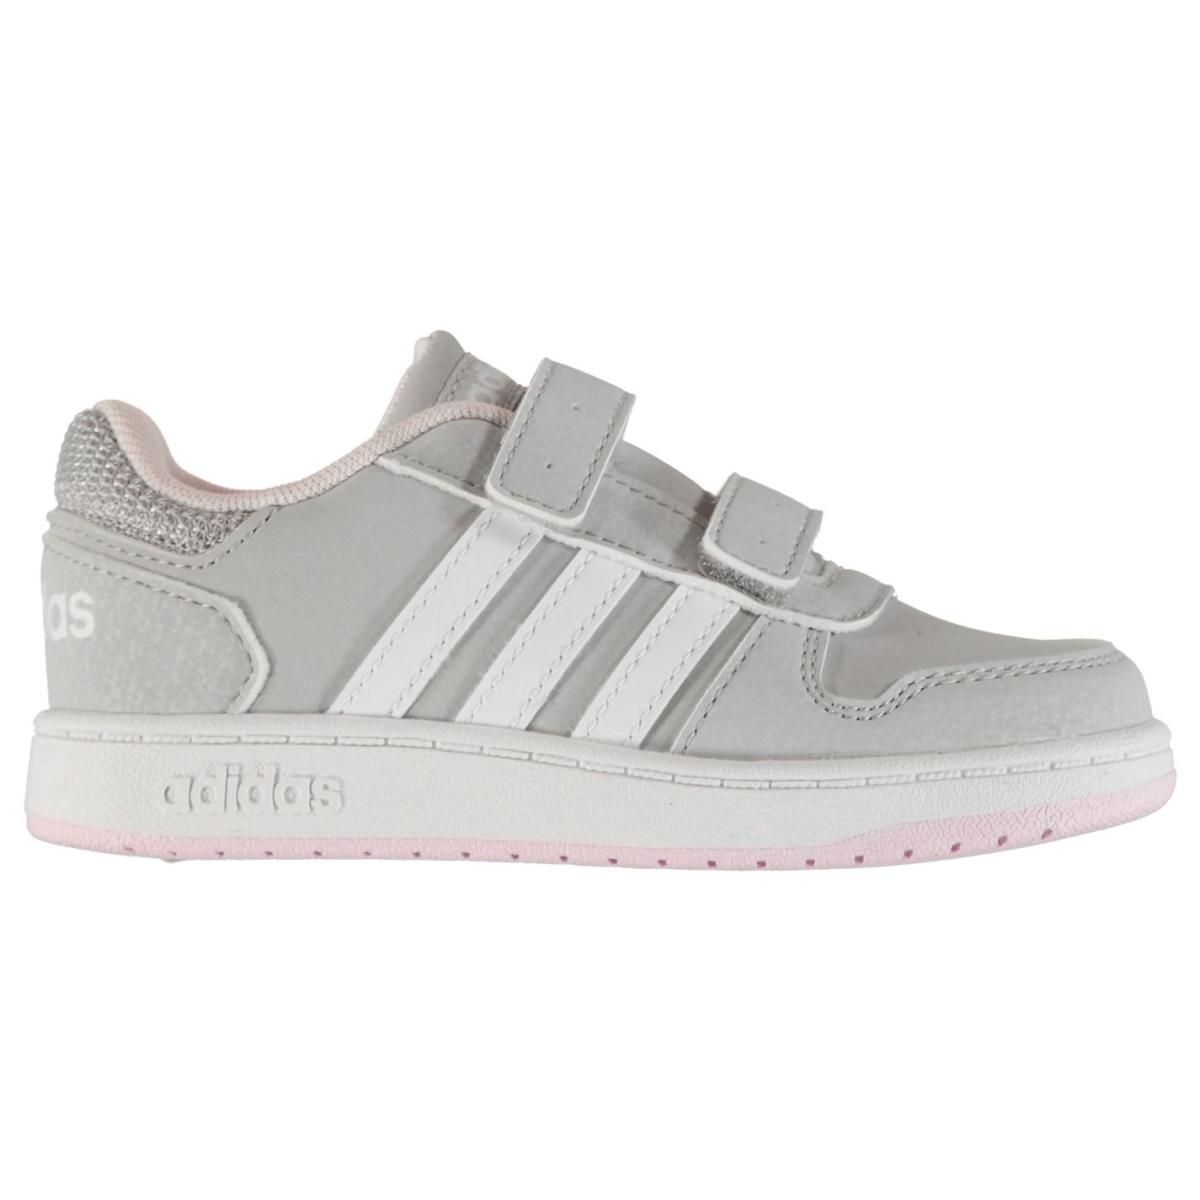 adidas Mädchen Turnschuhe Hoops LtGrau_Wht_Pink